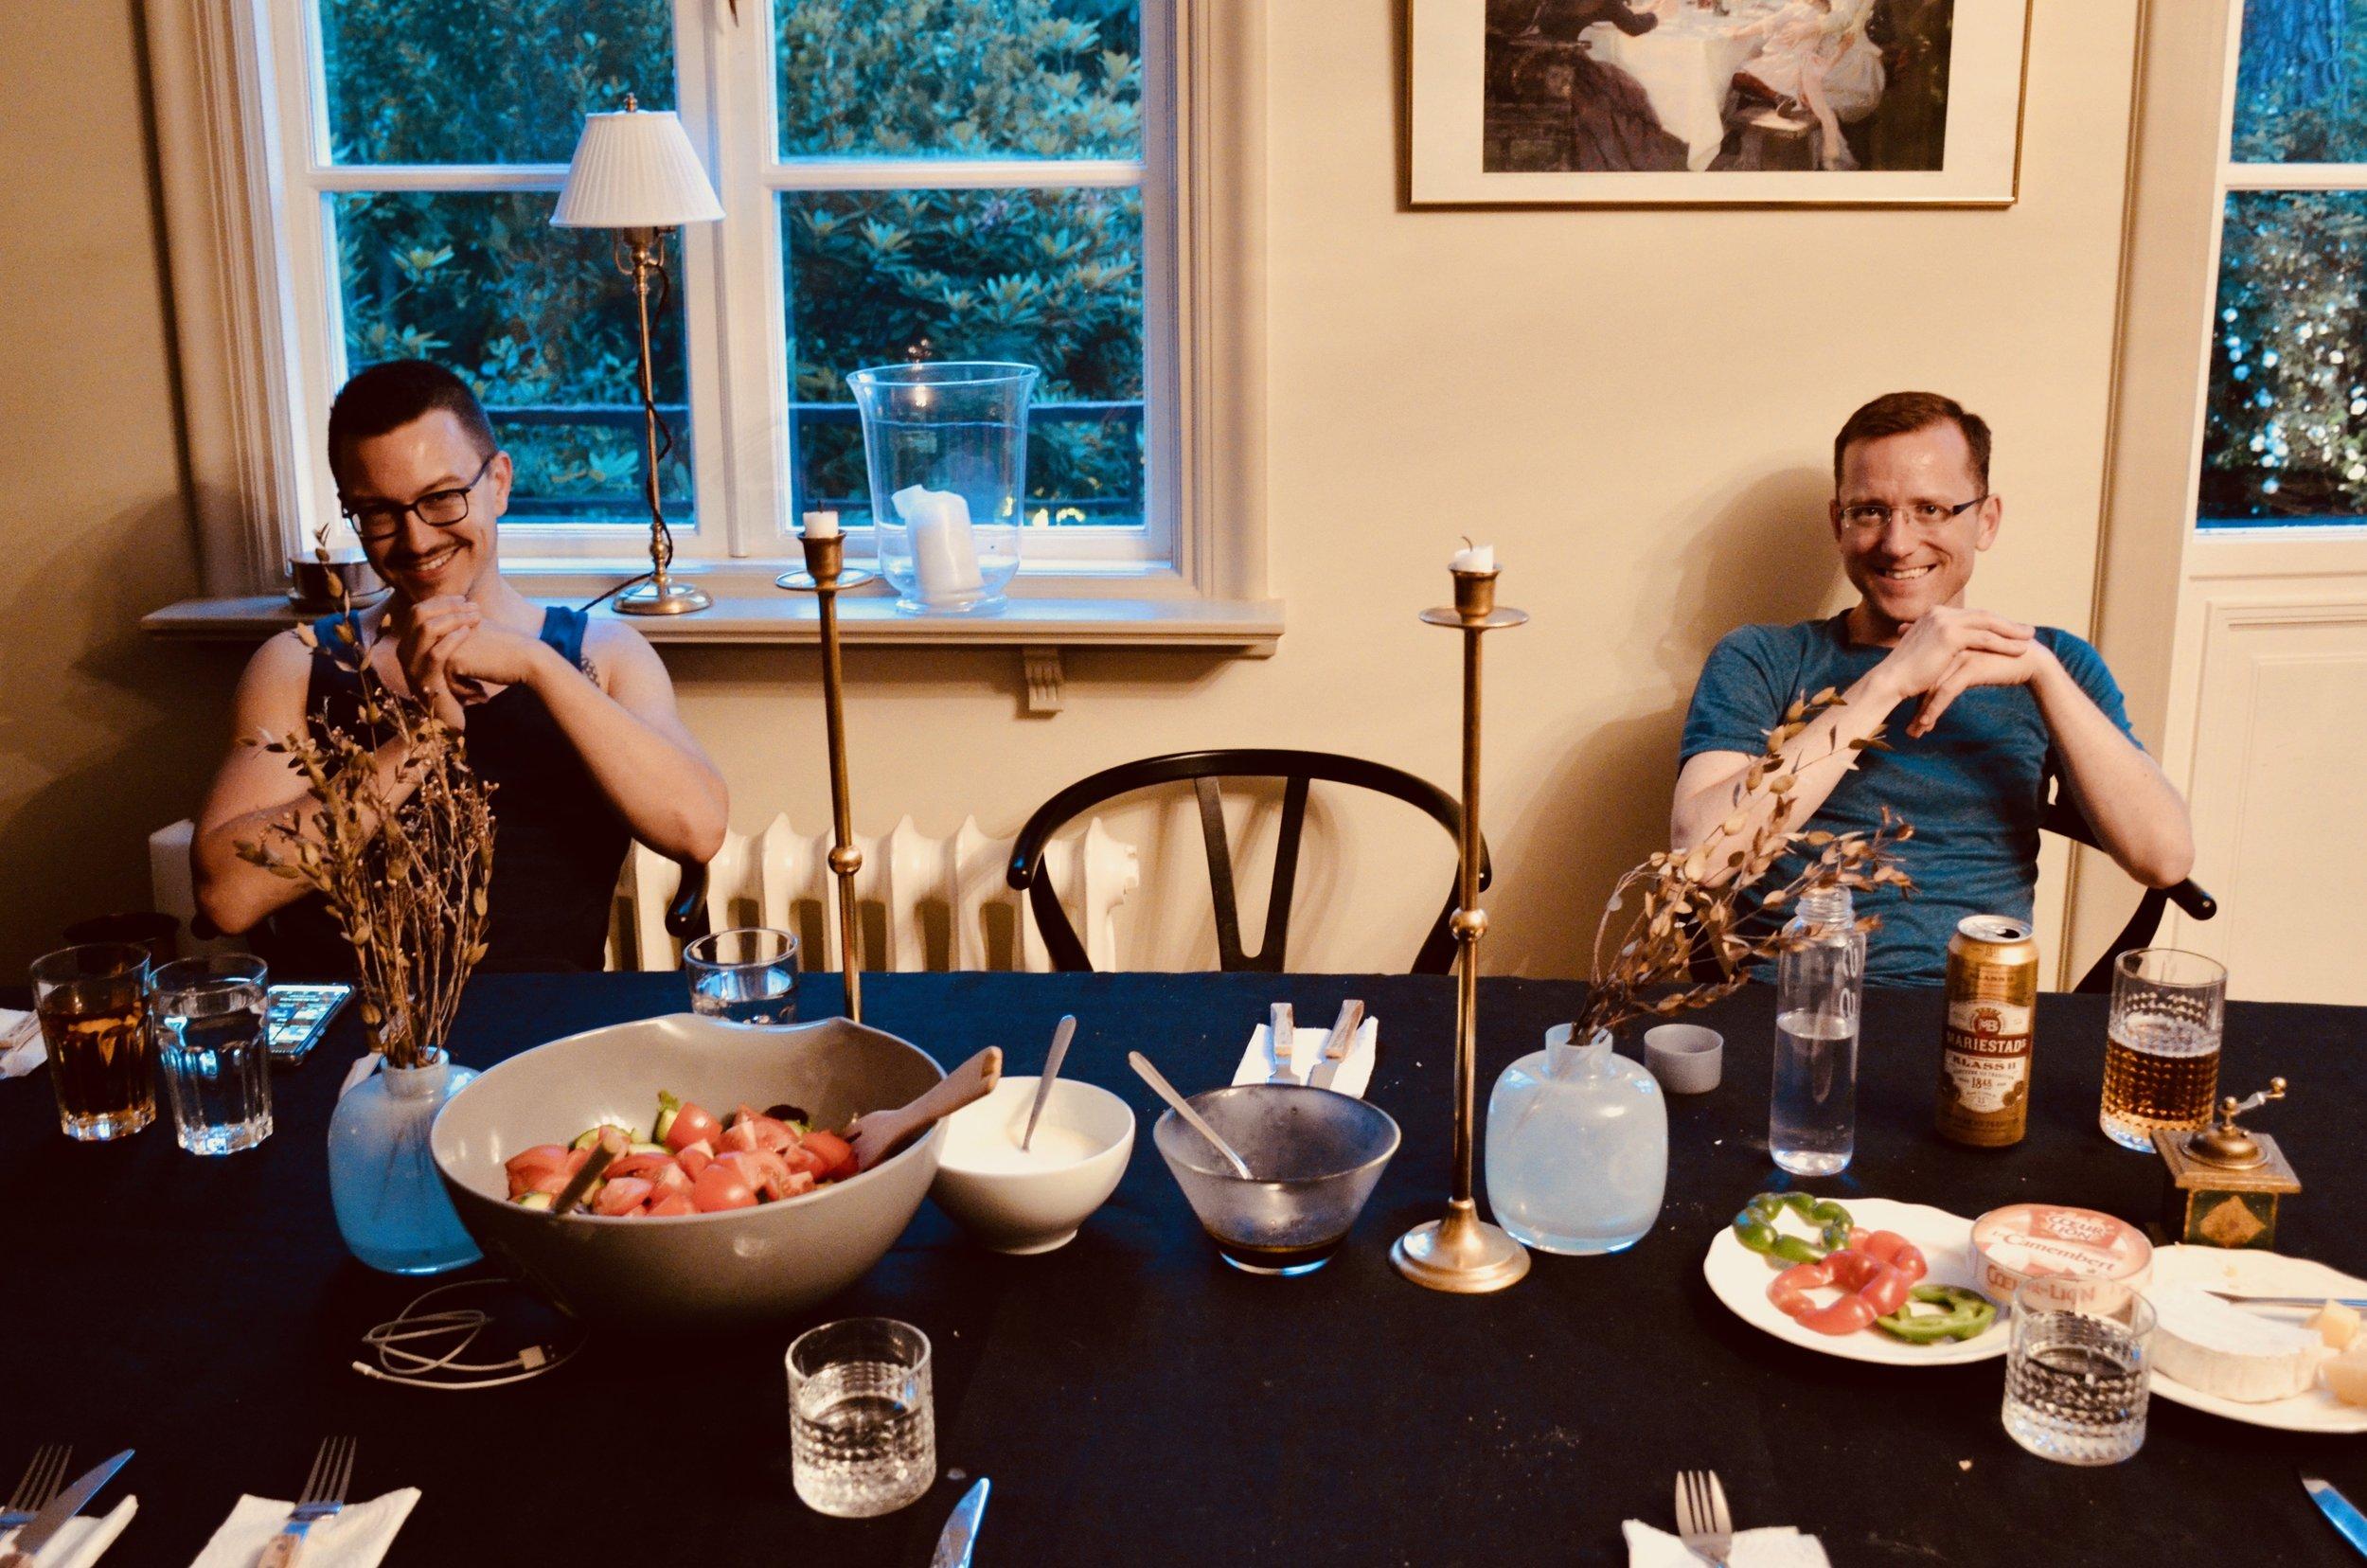 Corey De Tar and Christian Lane await dinner.